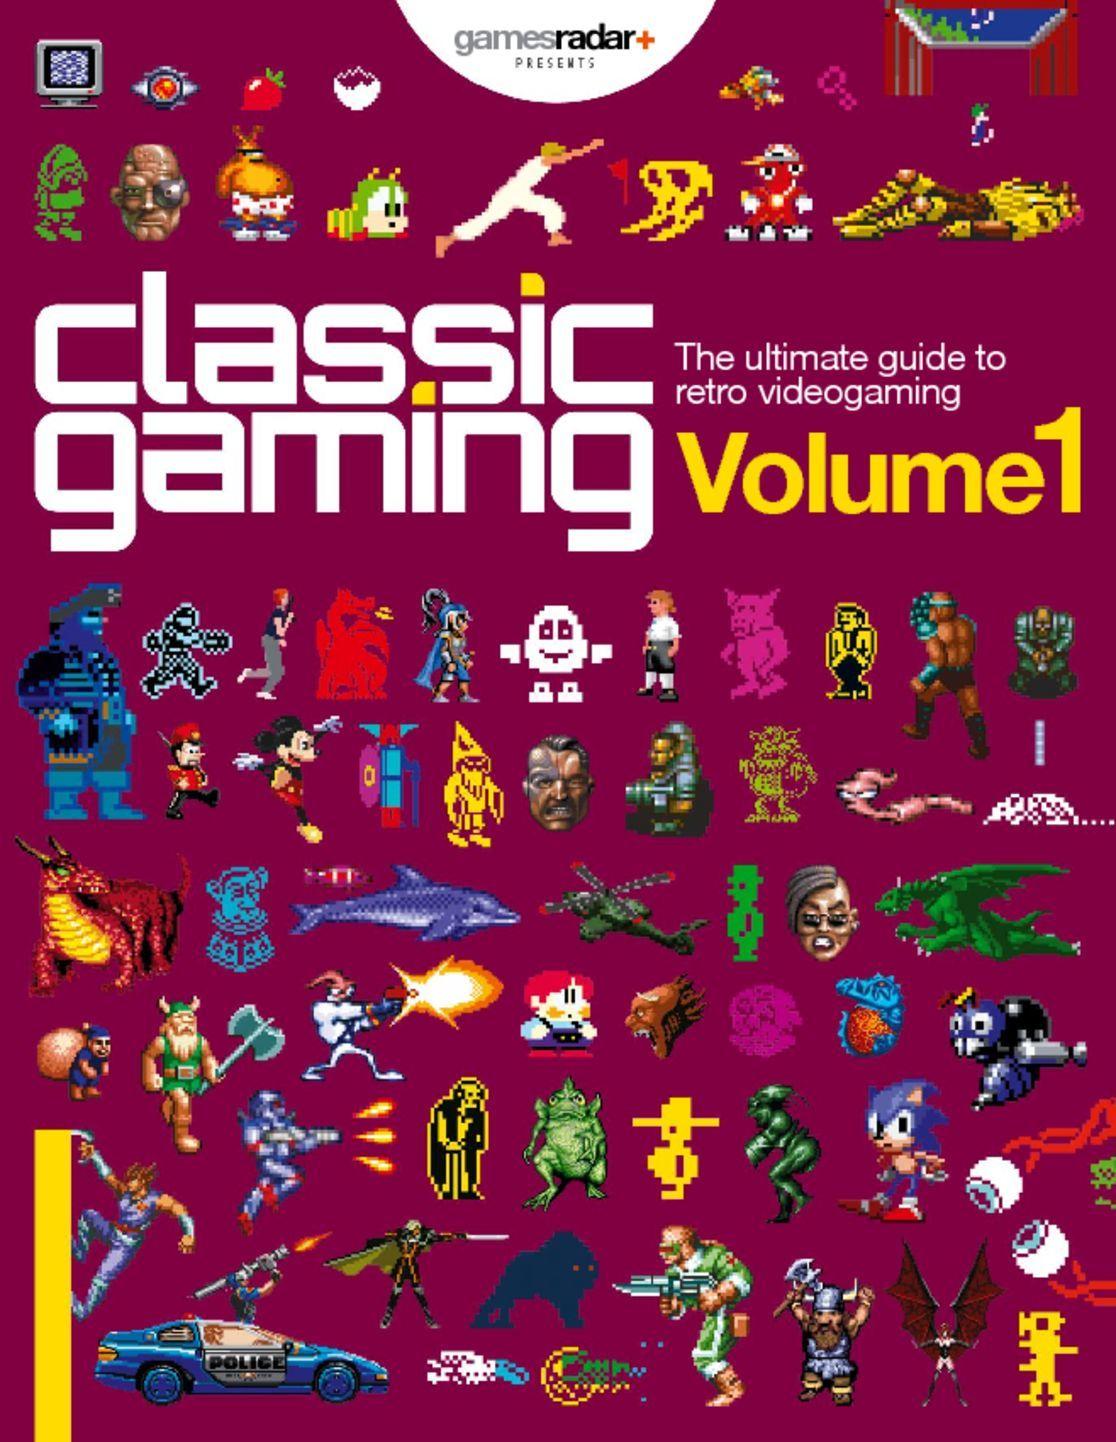 Classic Gaming Volume 1 Digital